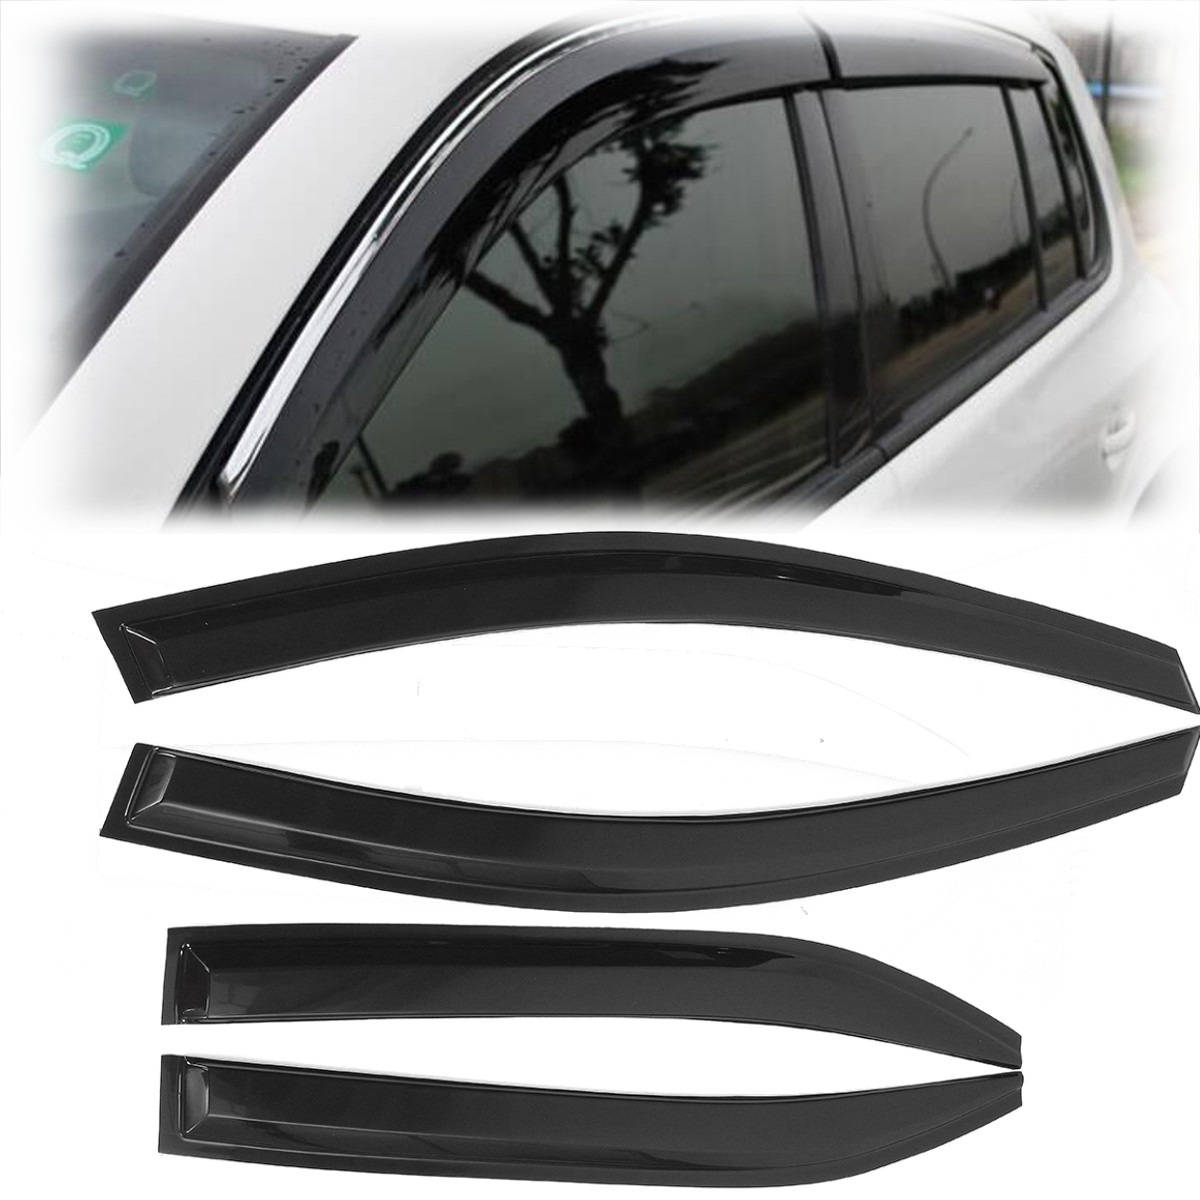 4 pcs set car window visor shade vent rain deflector cover for toyota camry